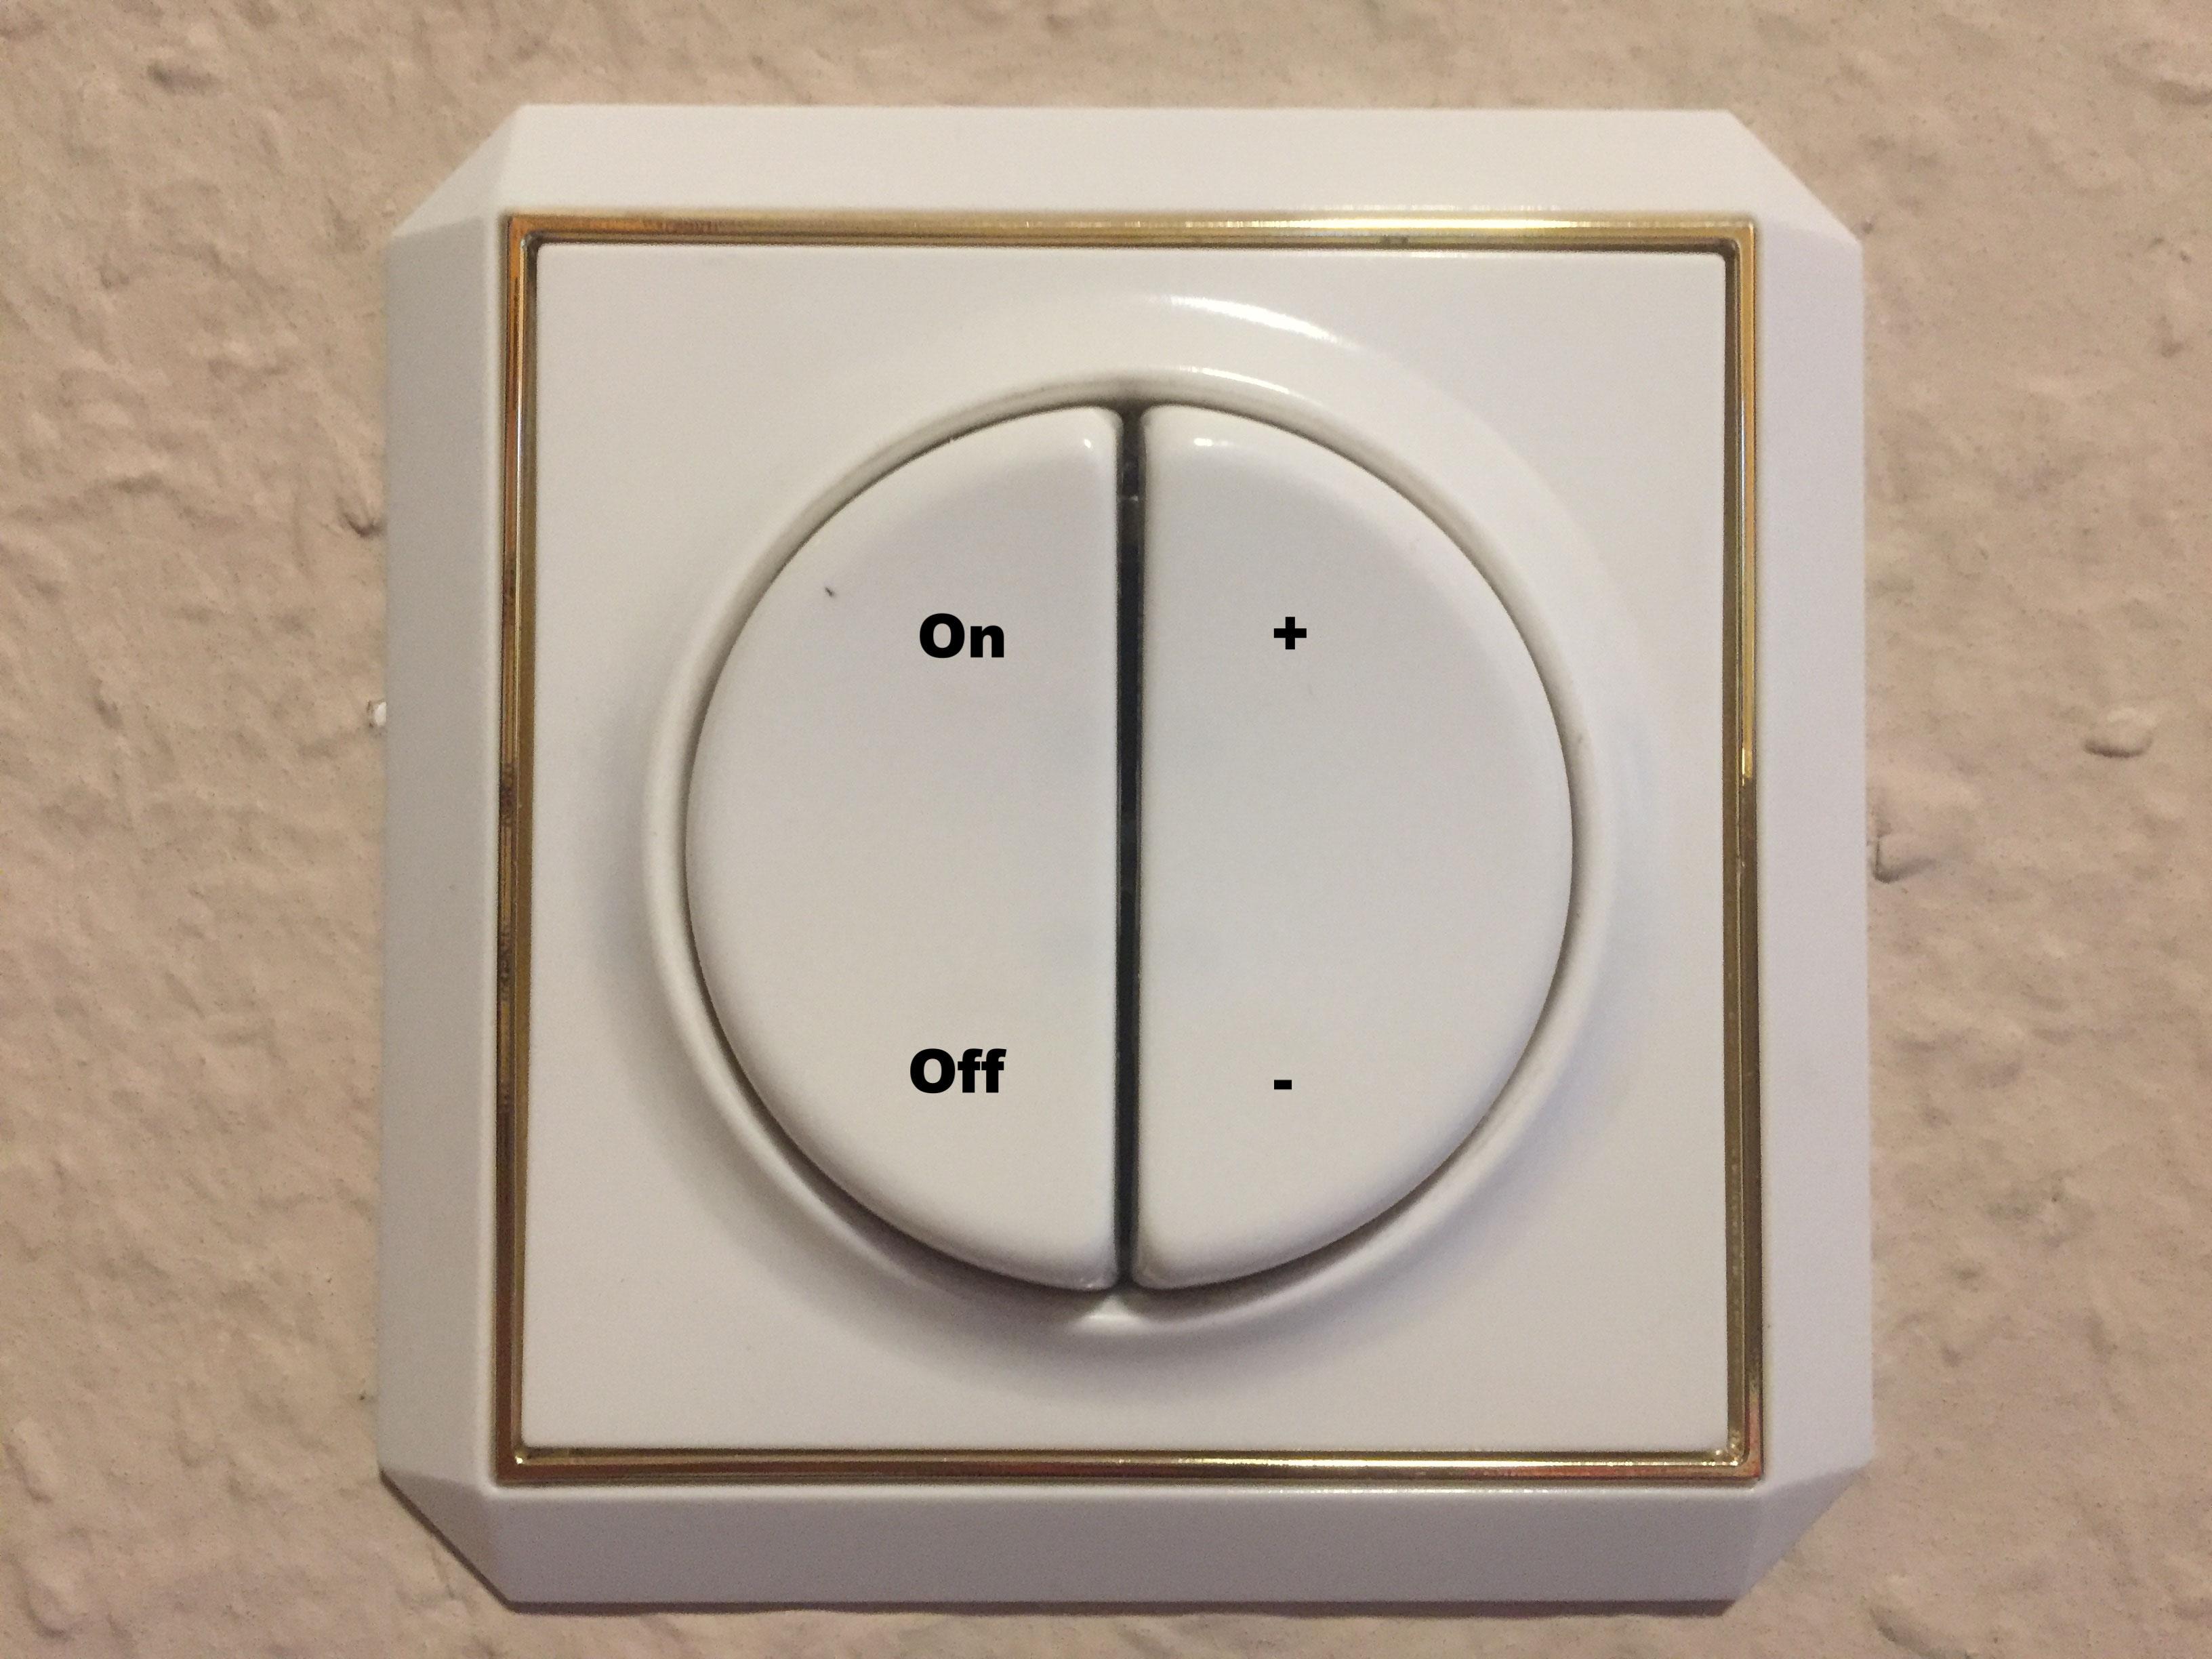 Tolle Haus Verdrahtung Bilder Galerie - Elektrische Schaltplan-Ideen ...